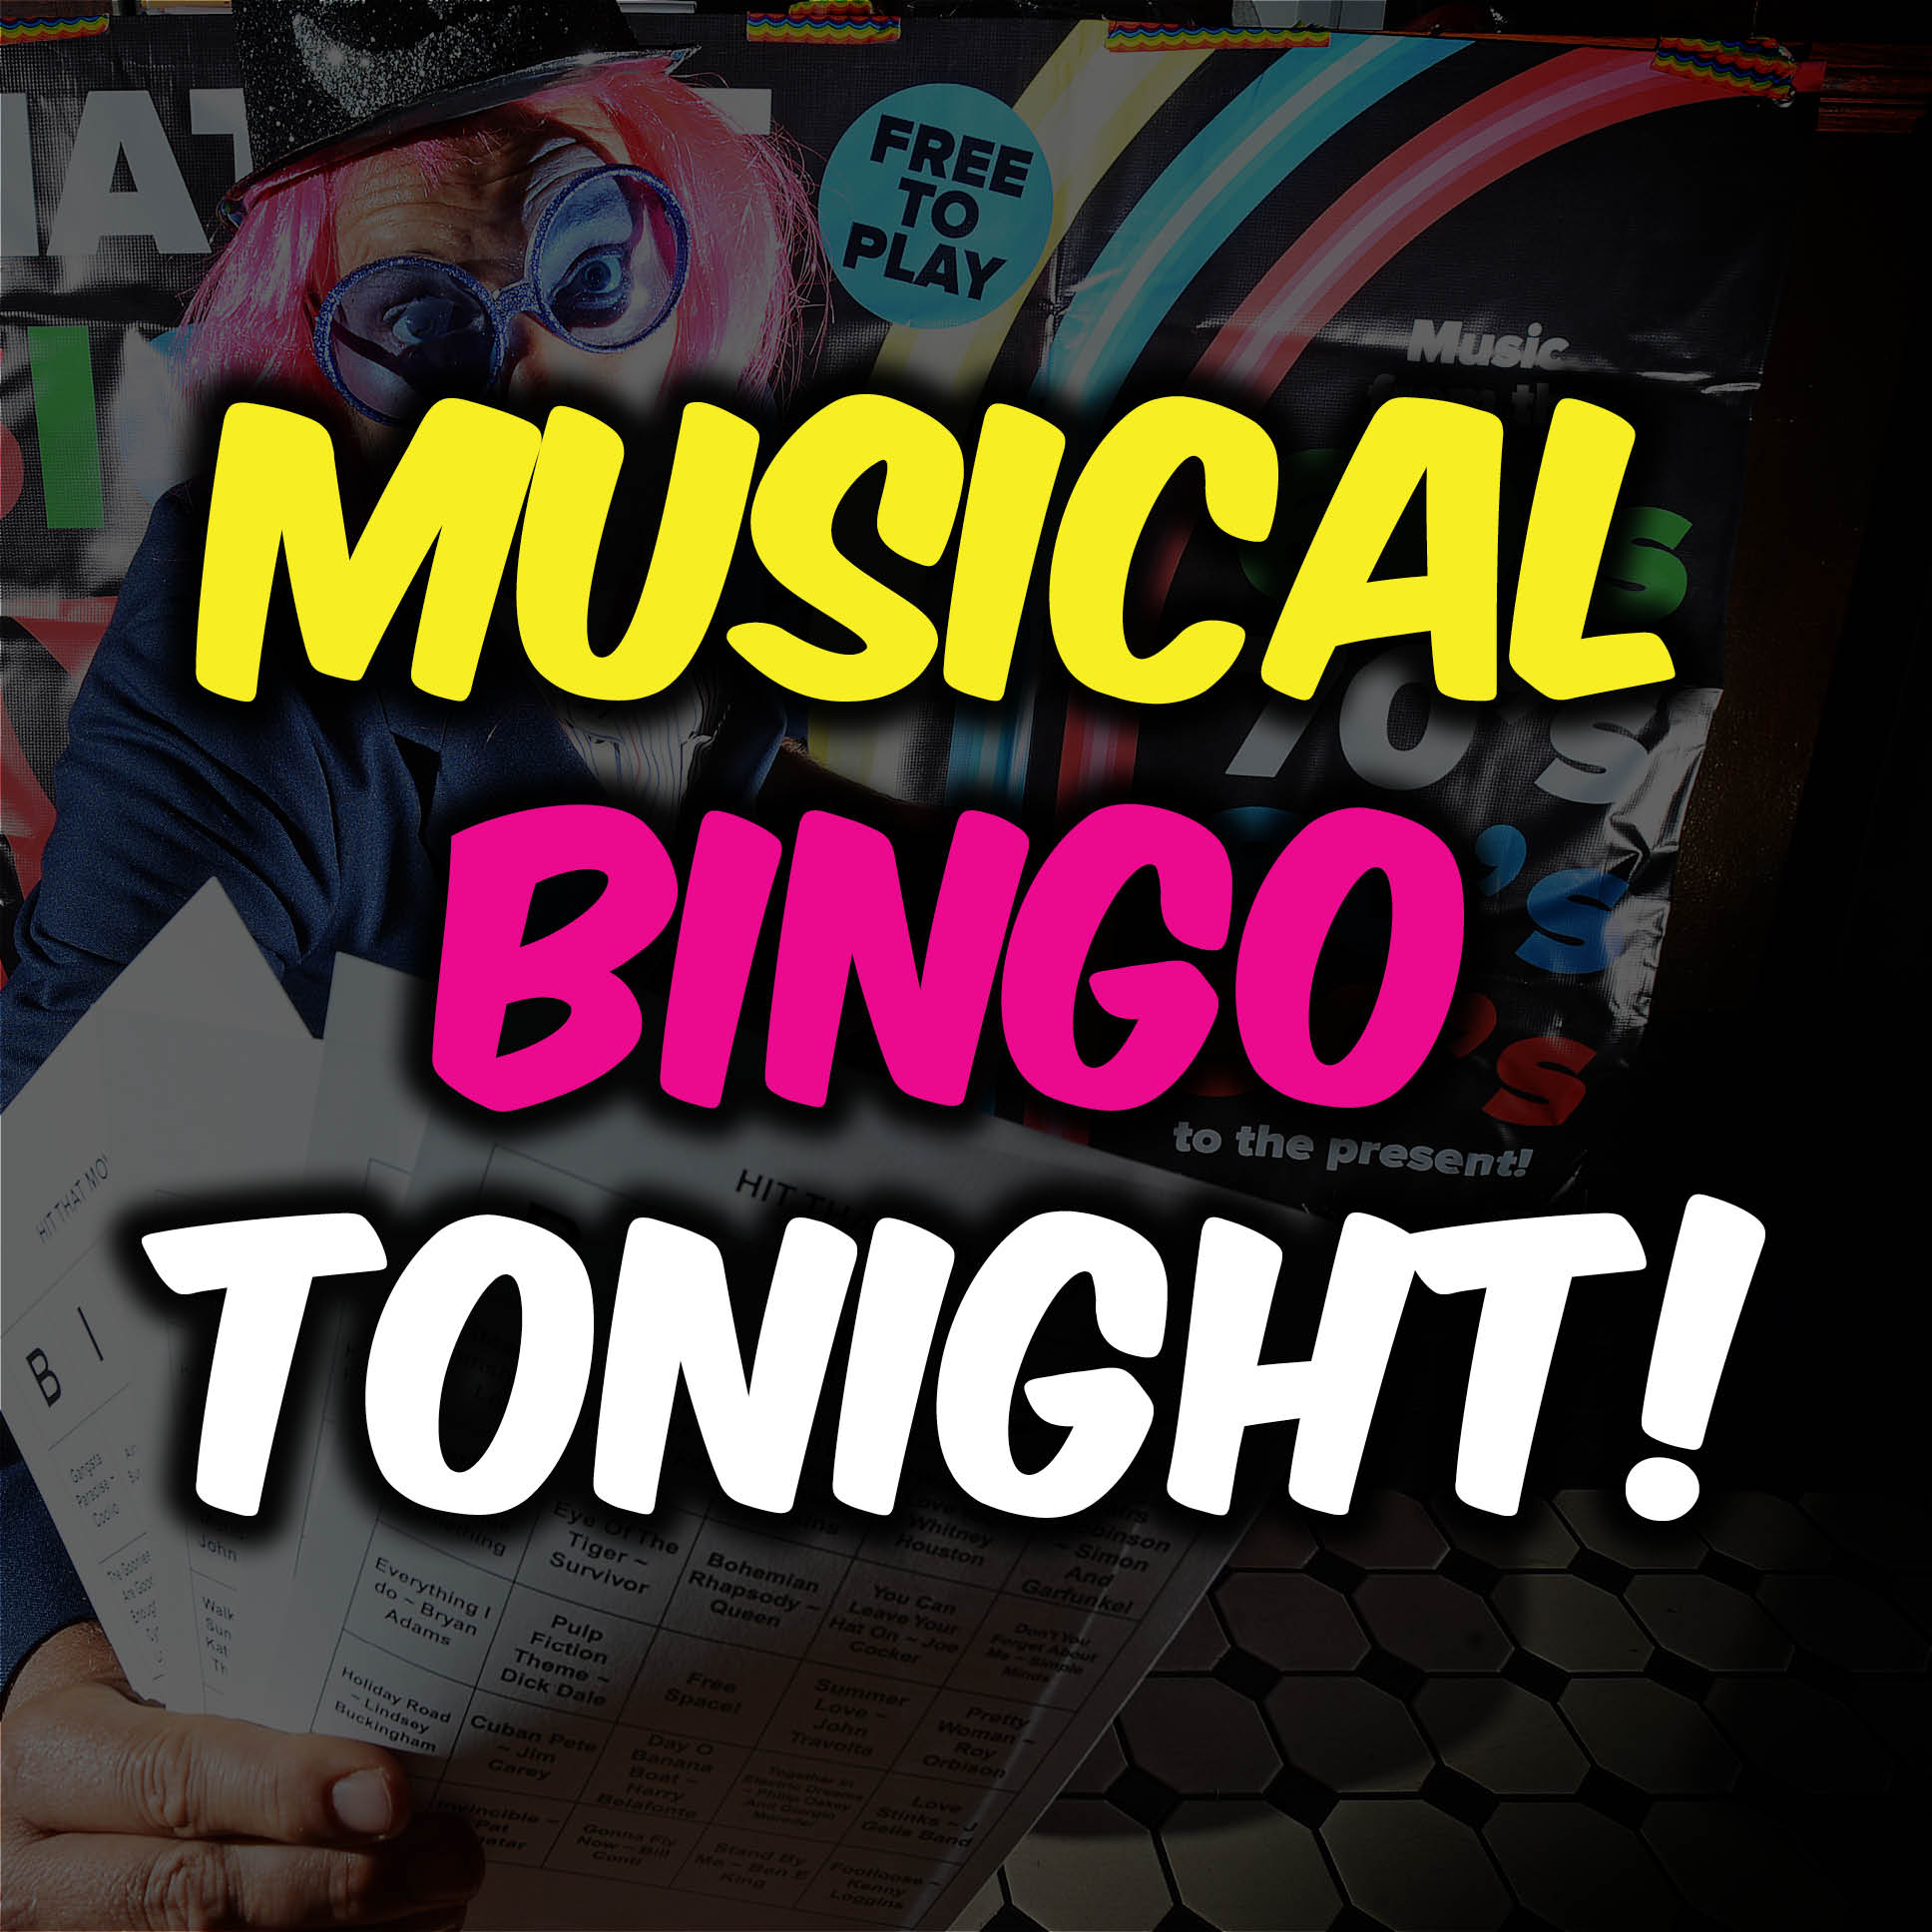 MUSICAL BINGO SOCIAL MEDIA & NIGHTLIFE16.jpg